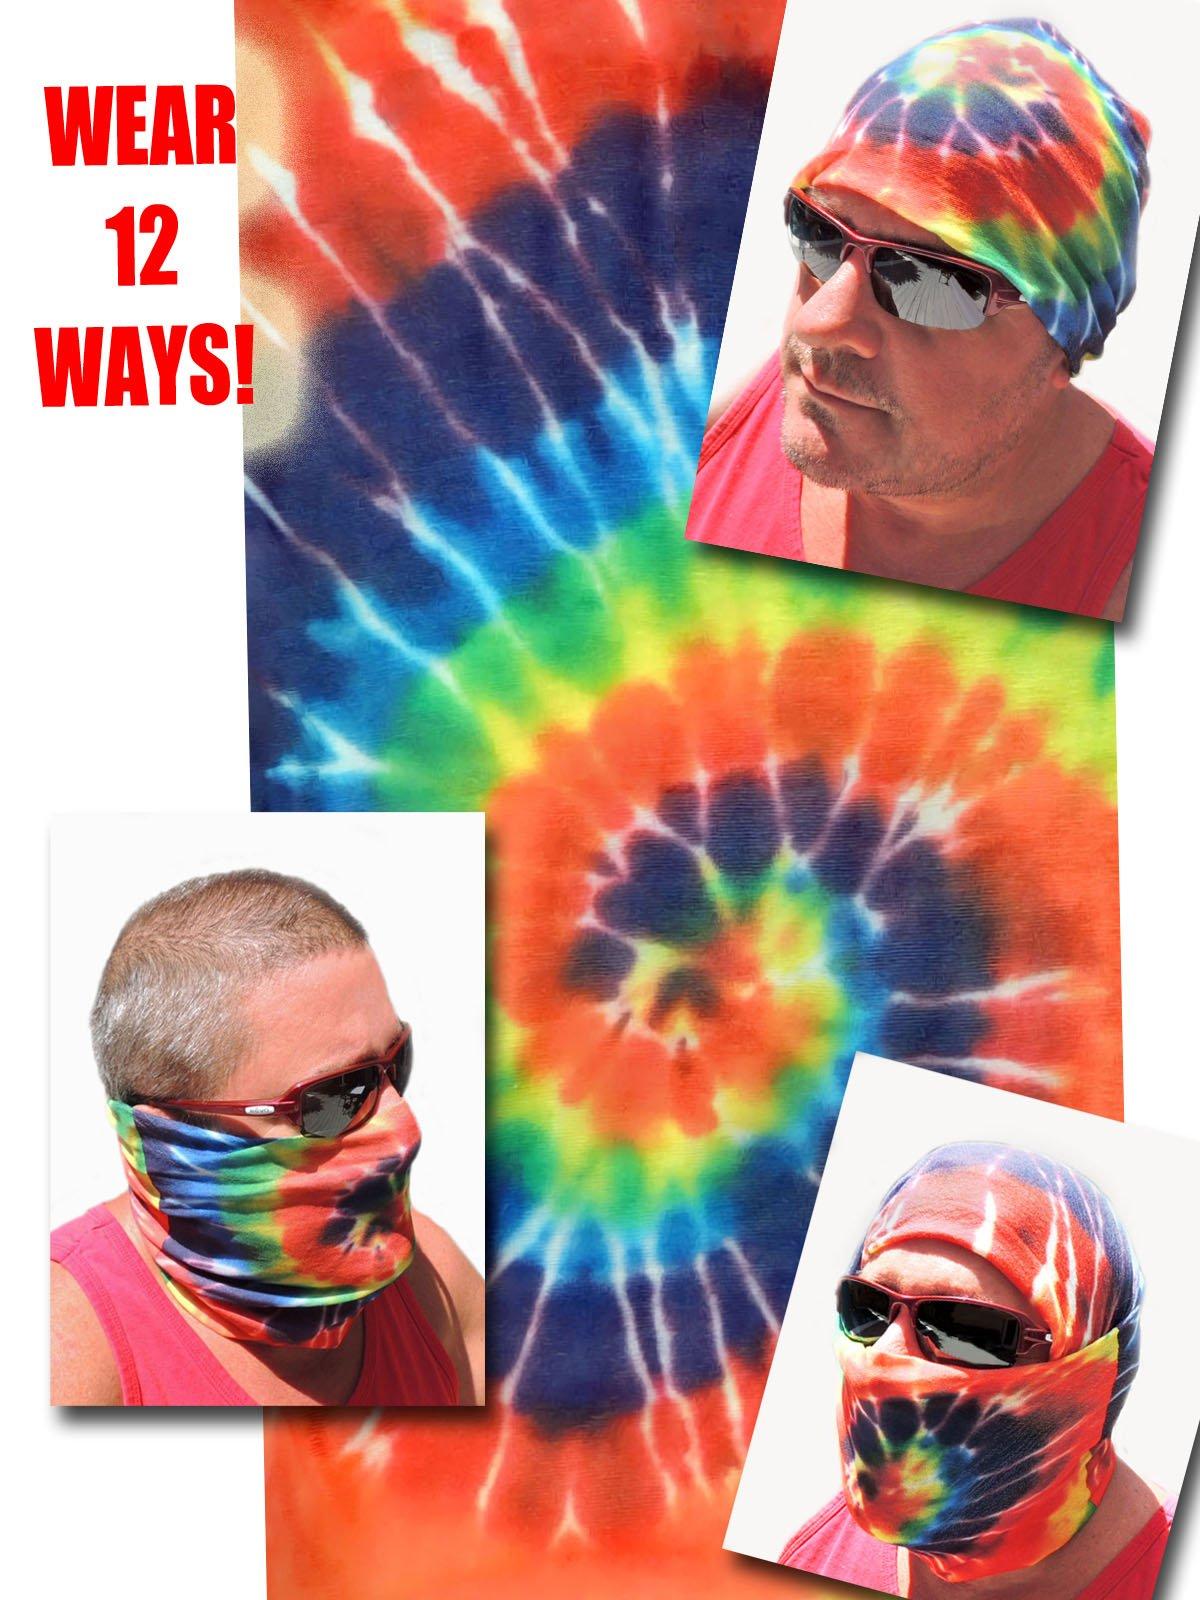 12-in-1 Headband - Tye Dye Grateful Dead - Versatile Sports & Casual Headwear - Wear as a Bandana, Neck Gaiter, Balaclava, Helmet Liner, Mask - High Performance Microfiber